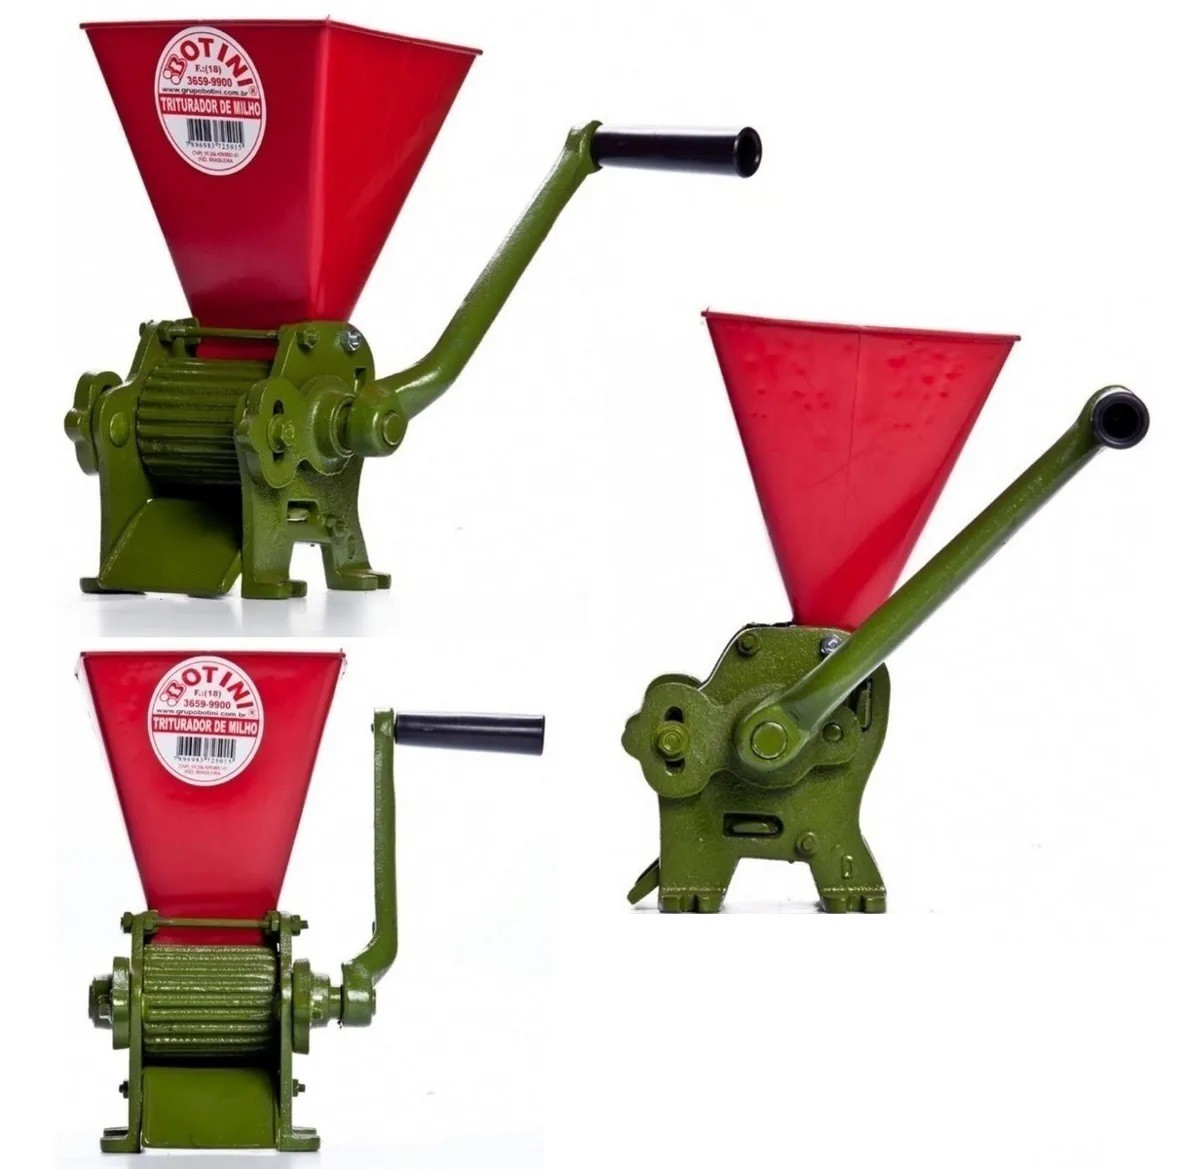 Triturador de Milho Simples Botini